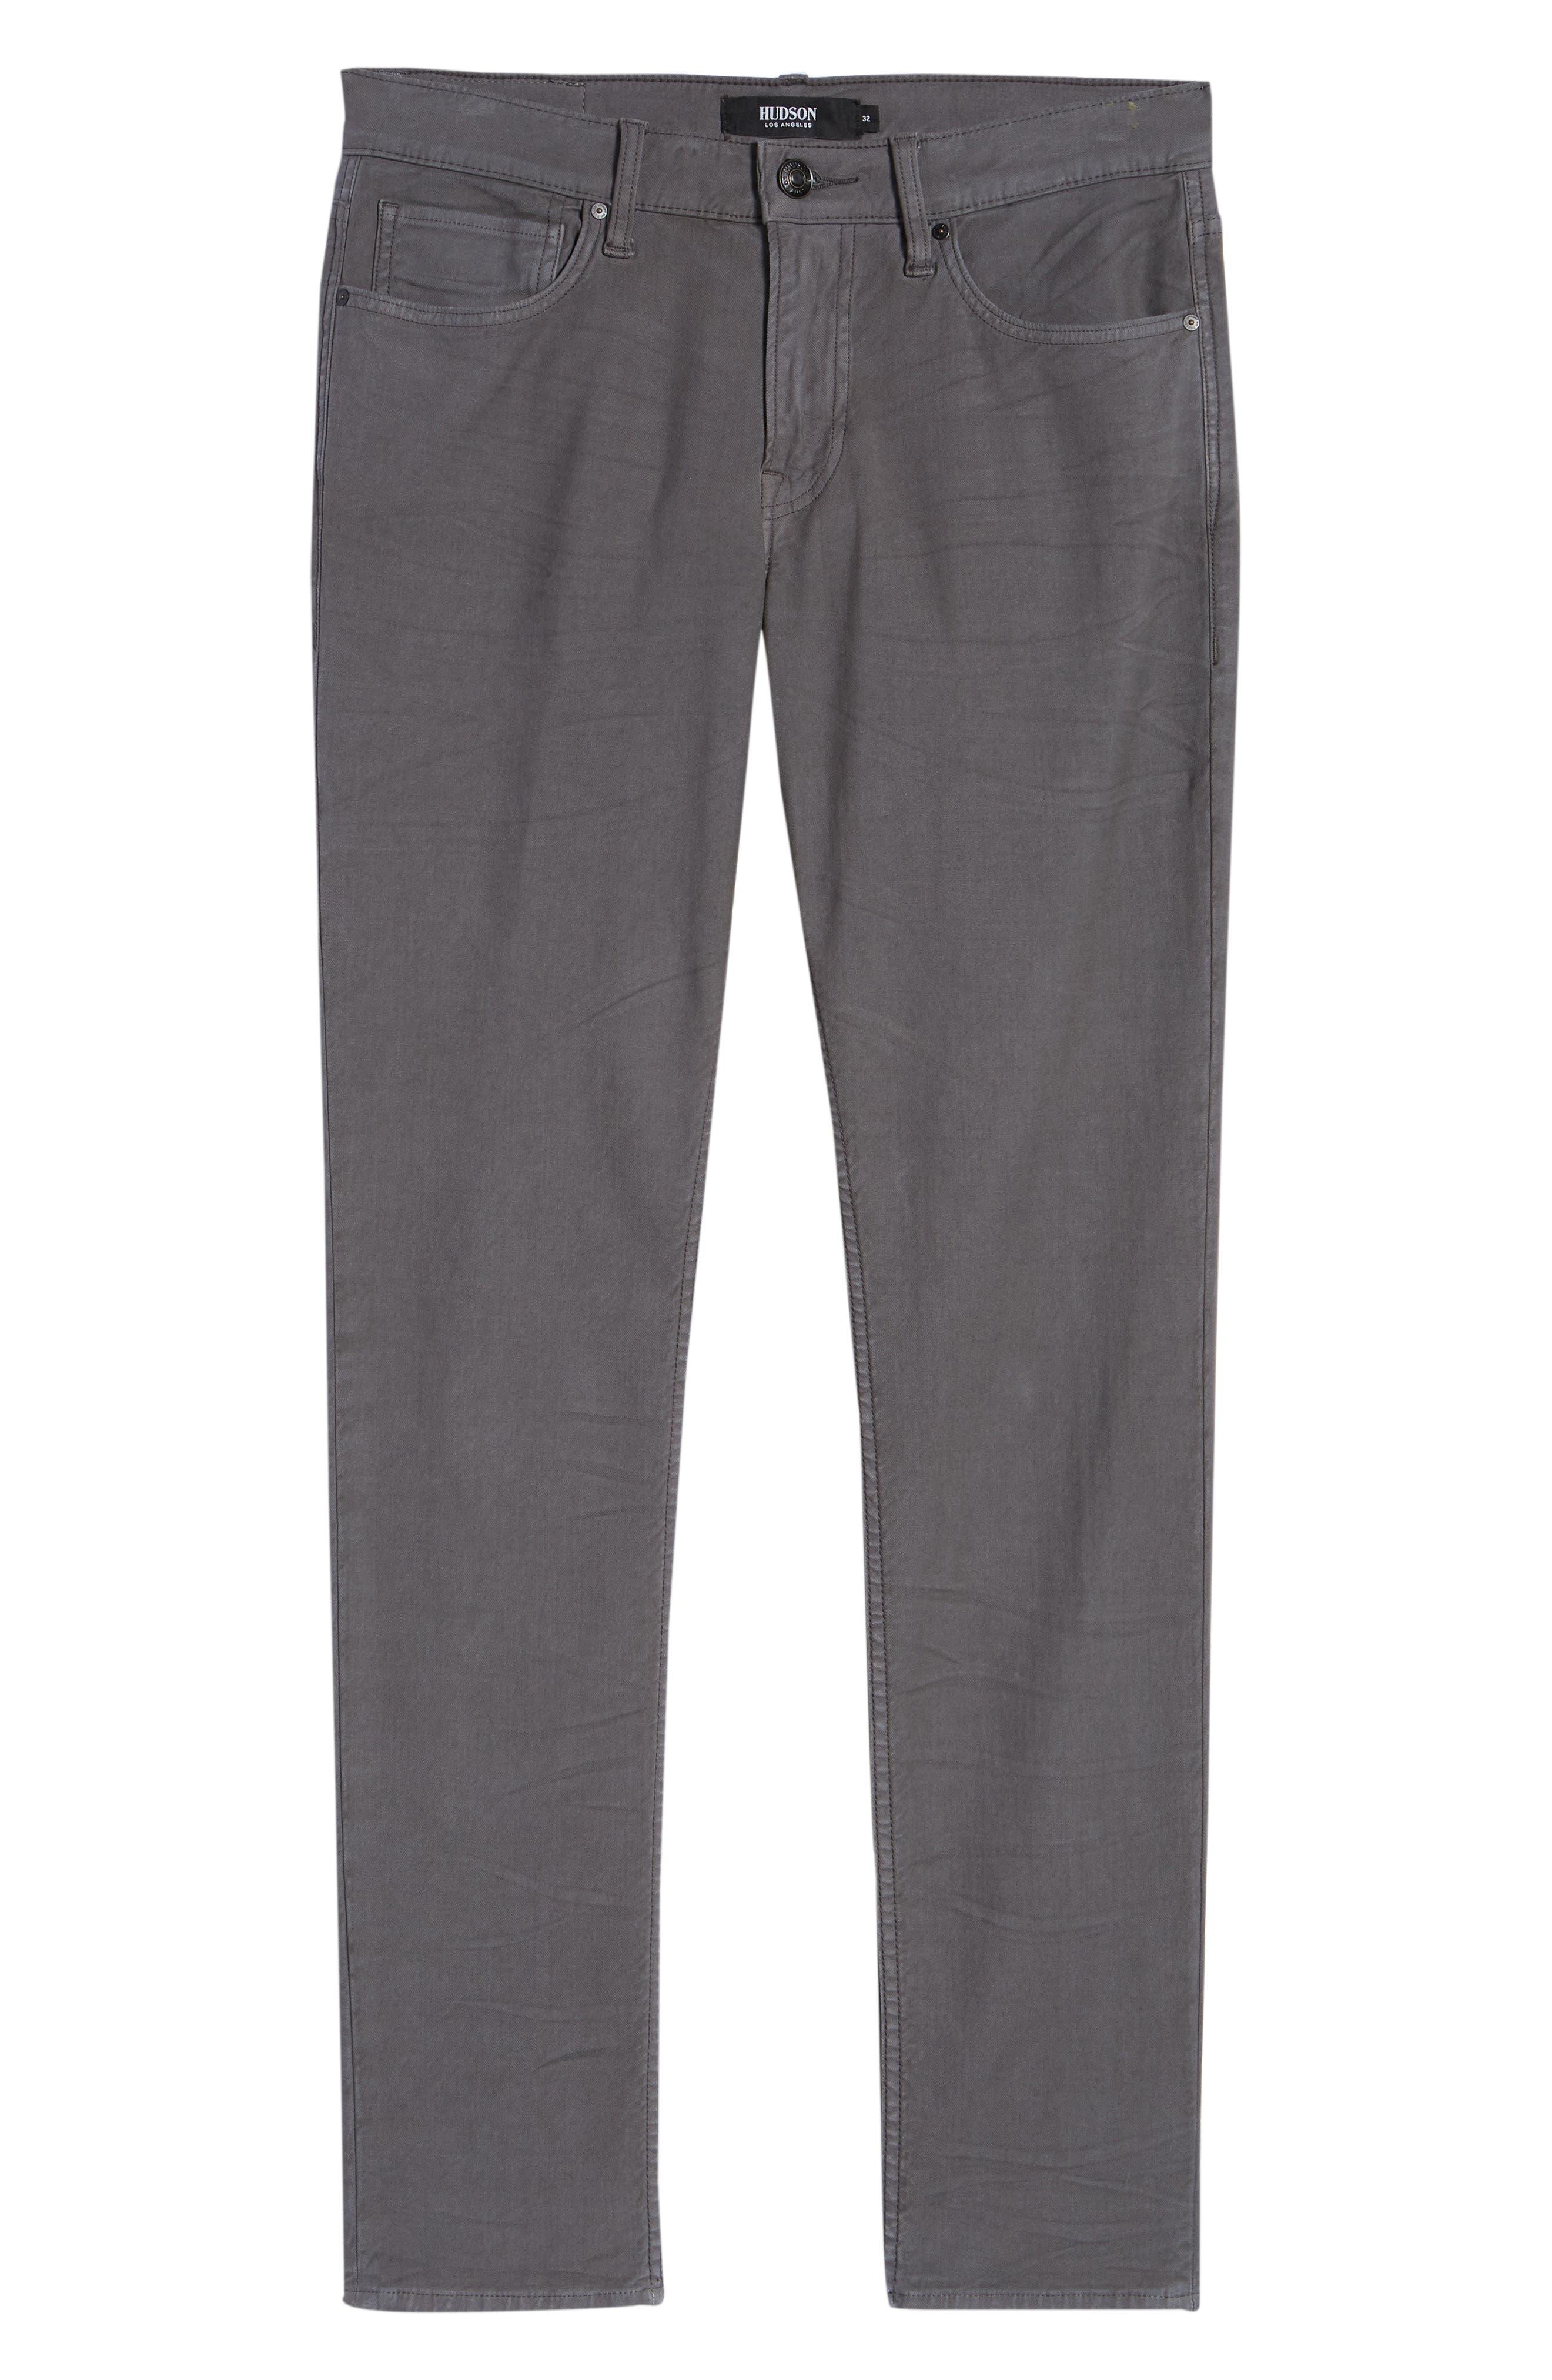 Hudson Axl Skinny Fit Jeans,                             Alternate thumbnail 6, color,                             GRAPHITE